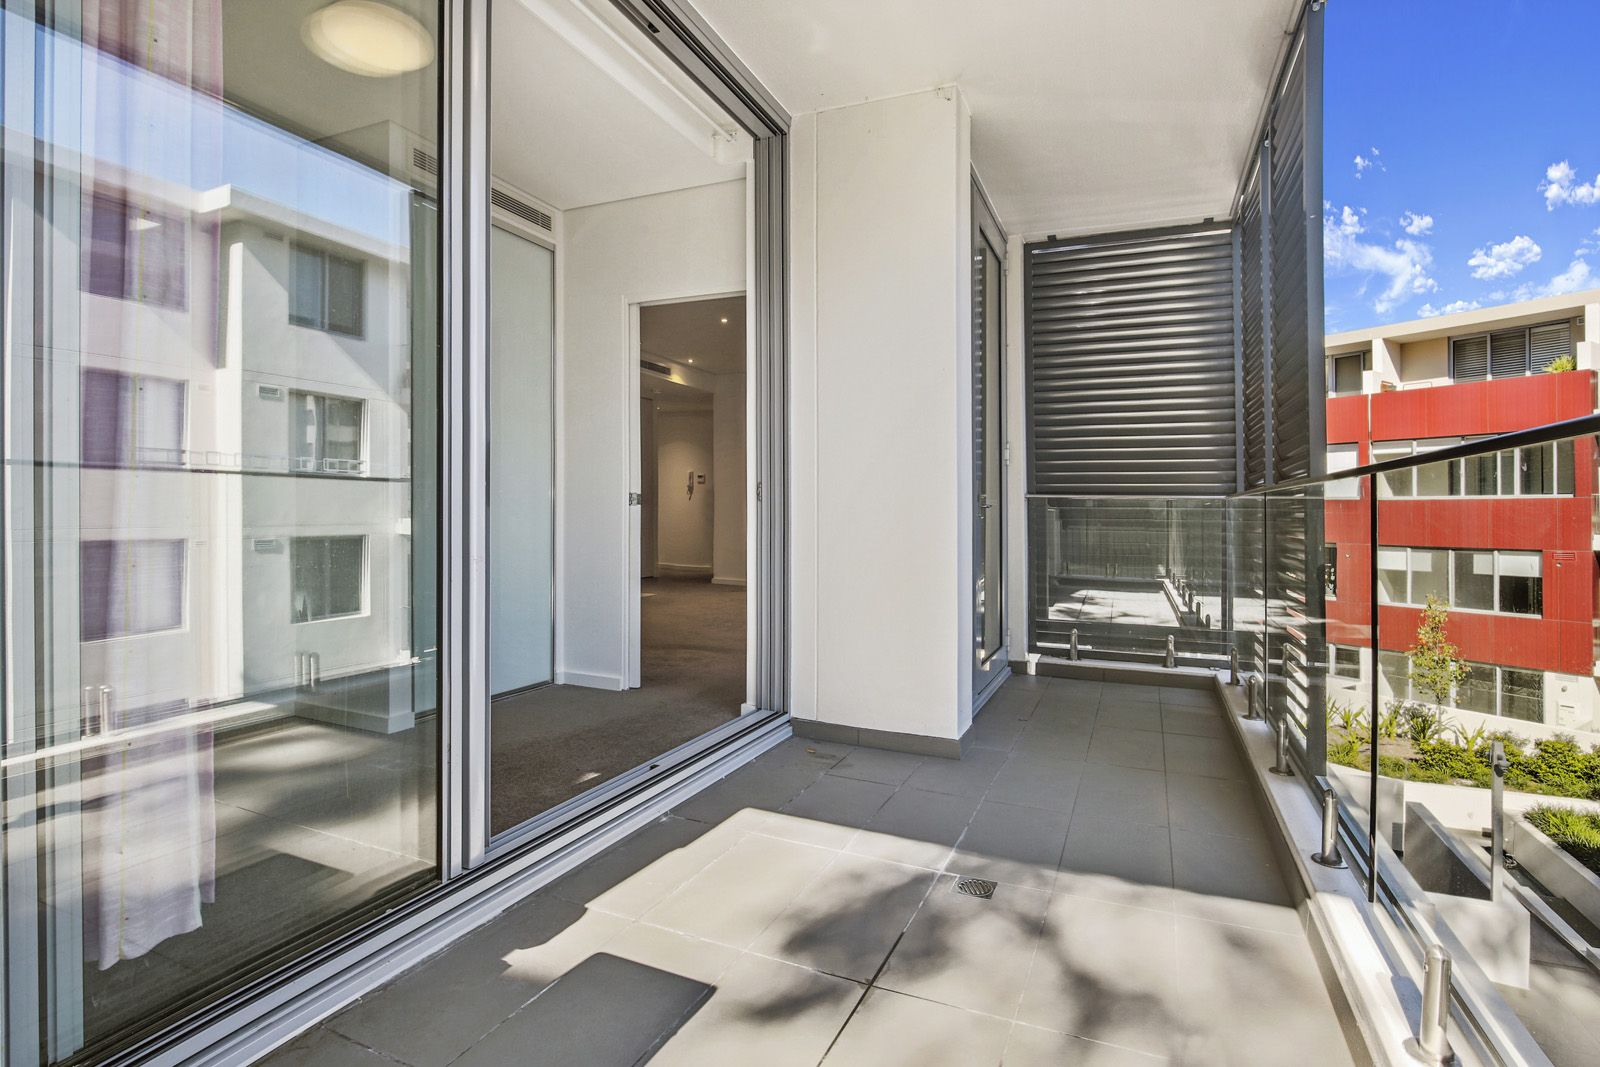 303B/7-13 Centennial Ave, Lane Cove NSW 2066, Image 0